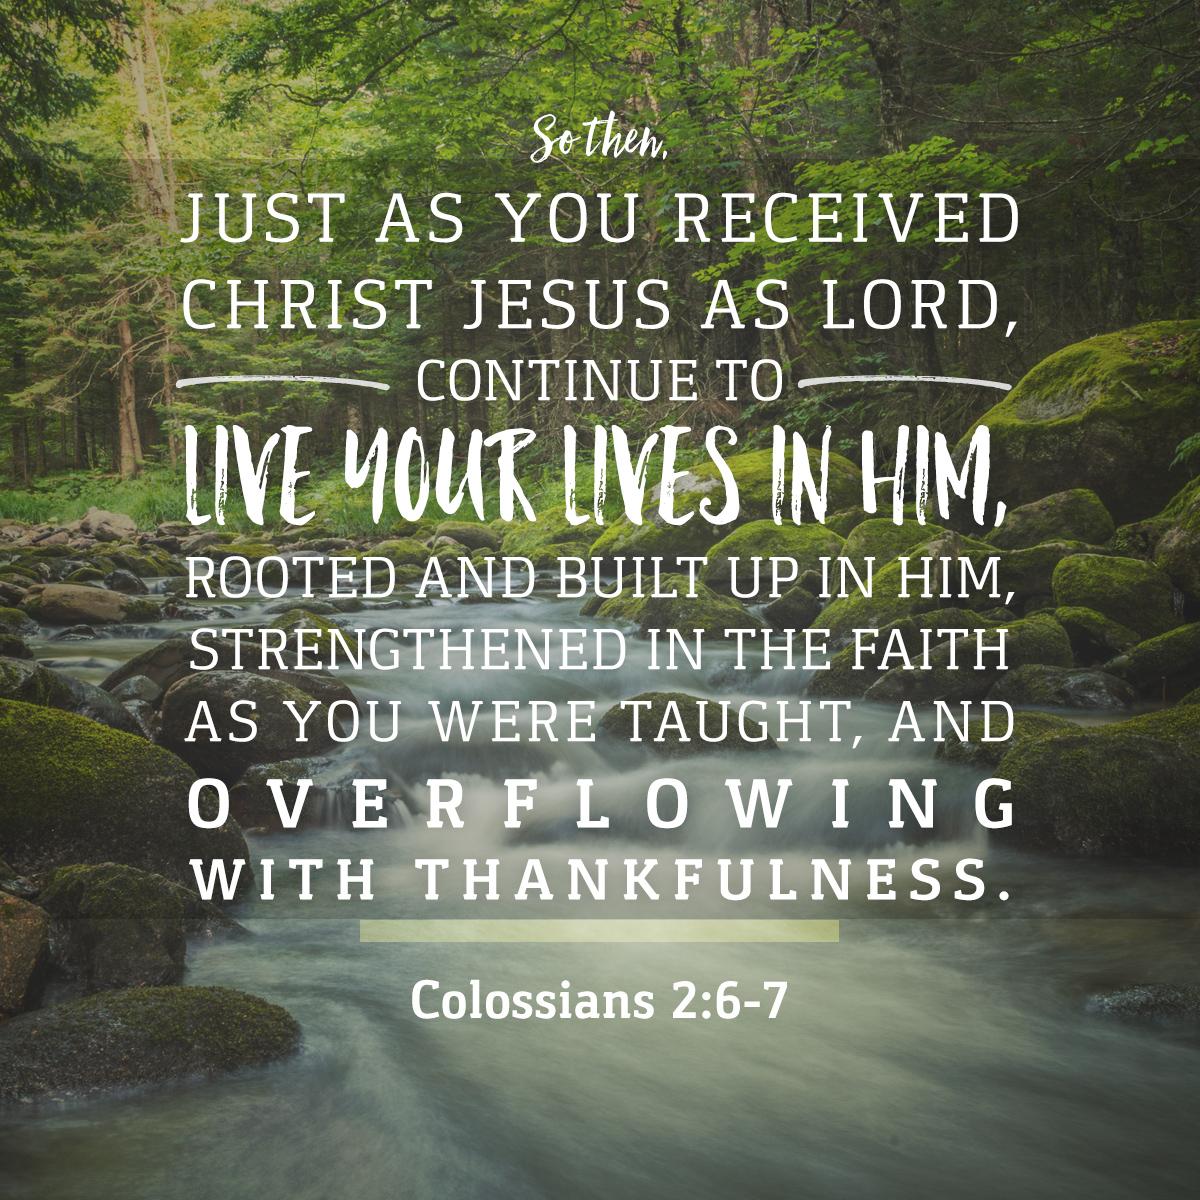 Colossians 2:6-7 Daily Verse